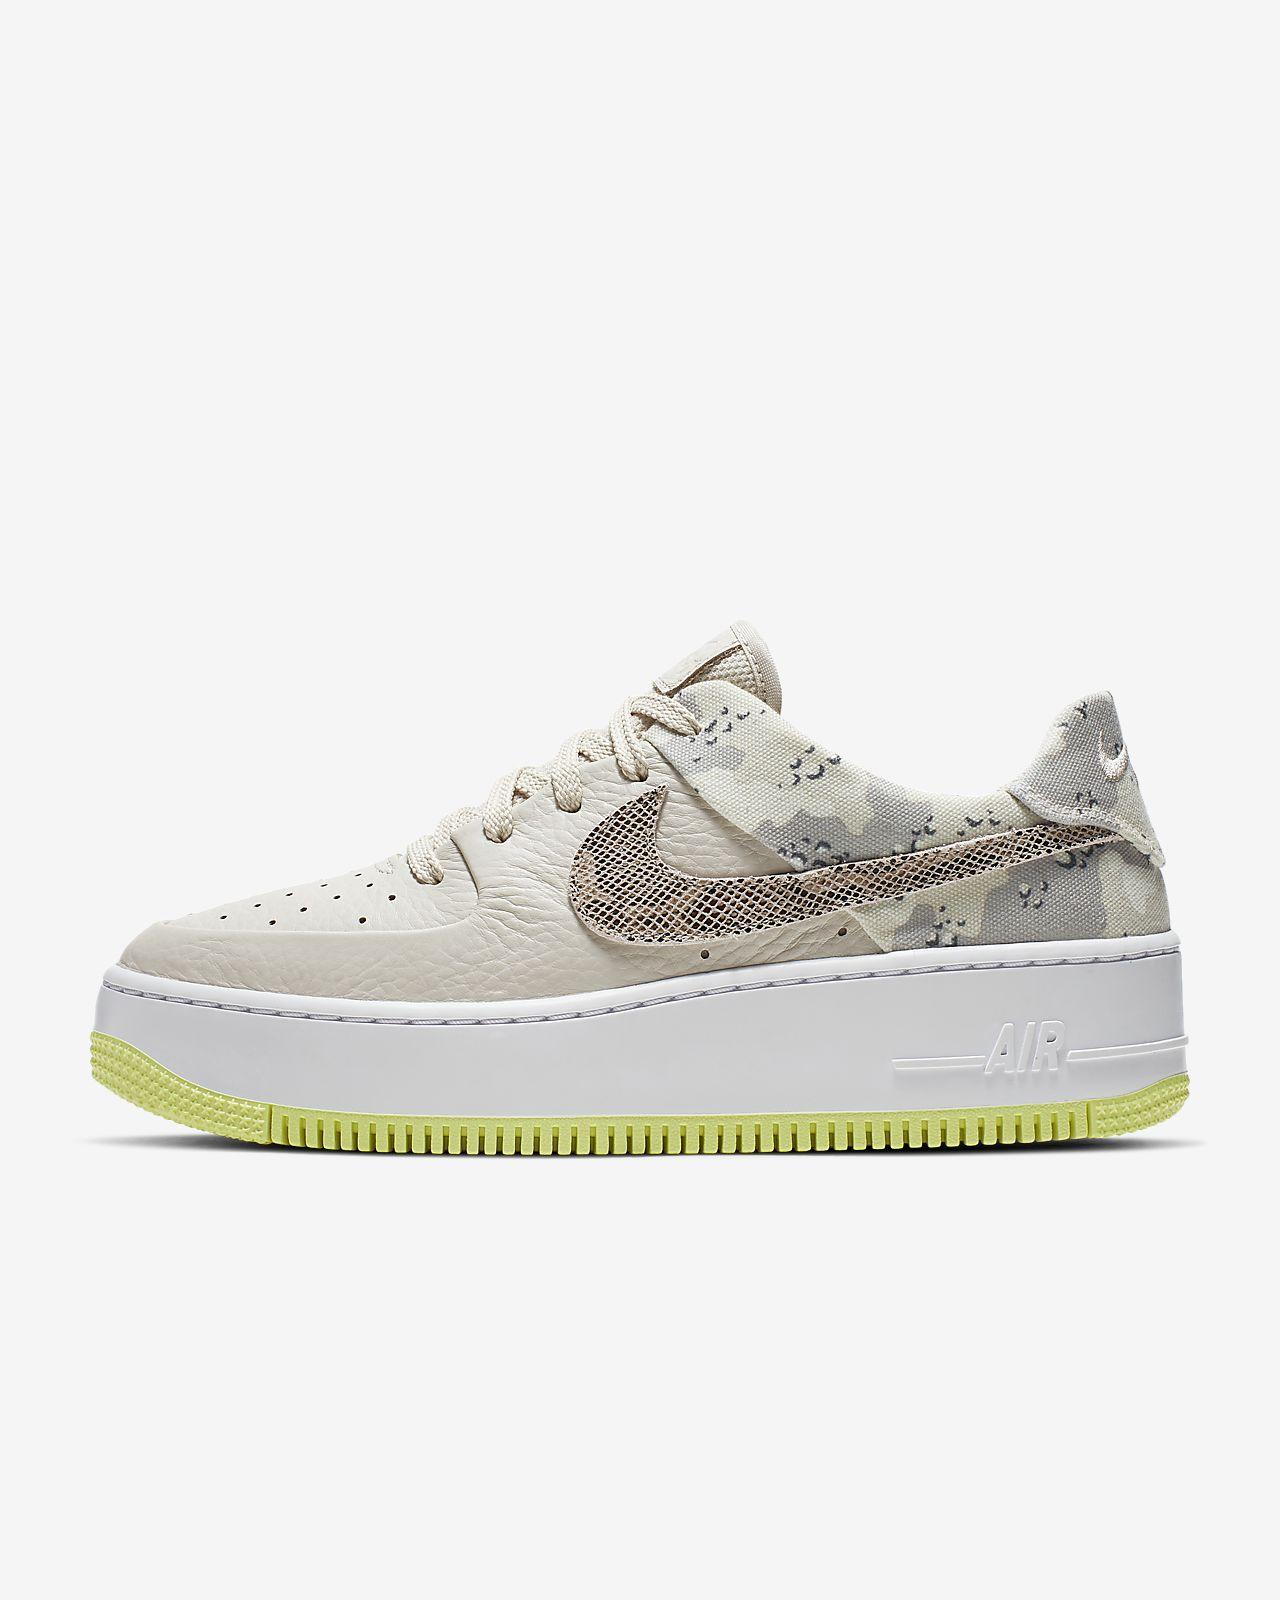 Dámská bota Nike Air Force 1 Sage Low Premium Camo